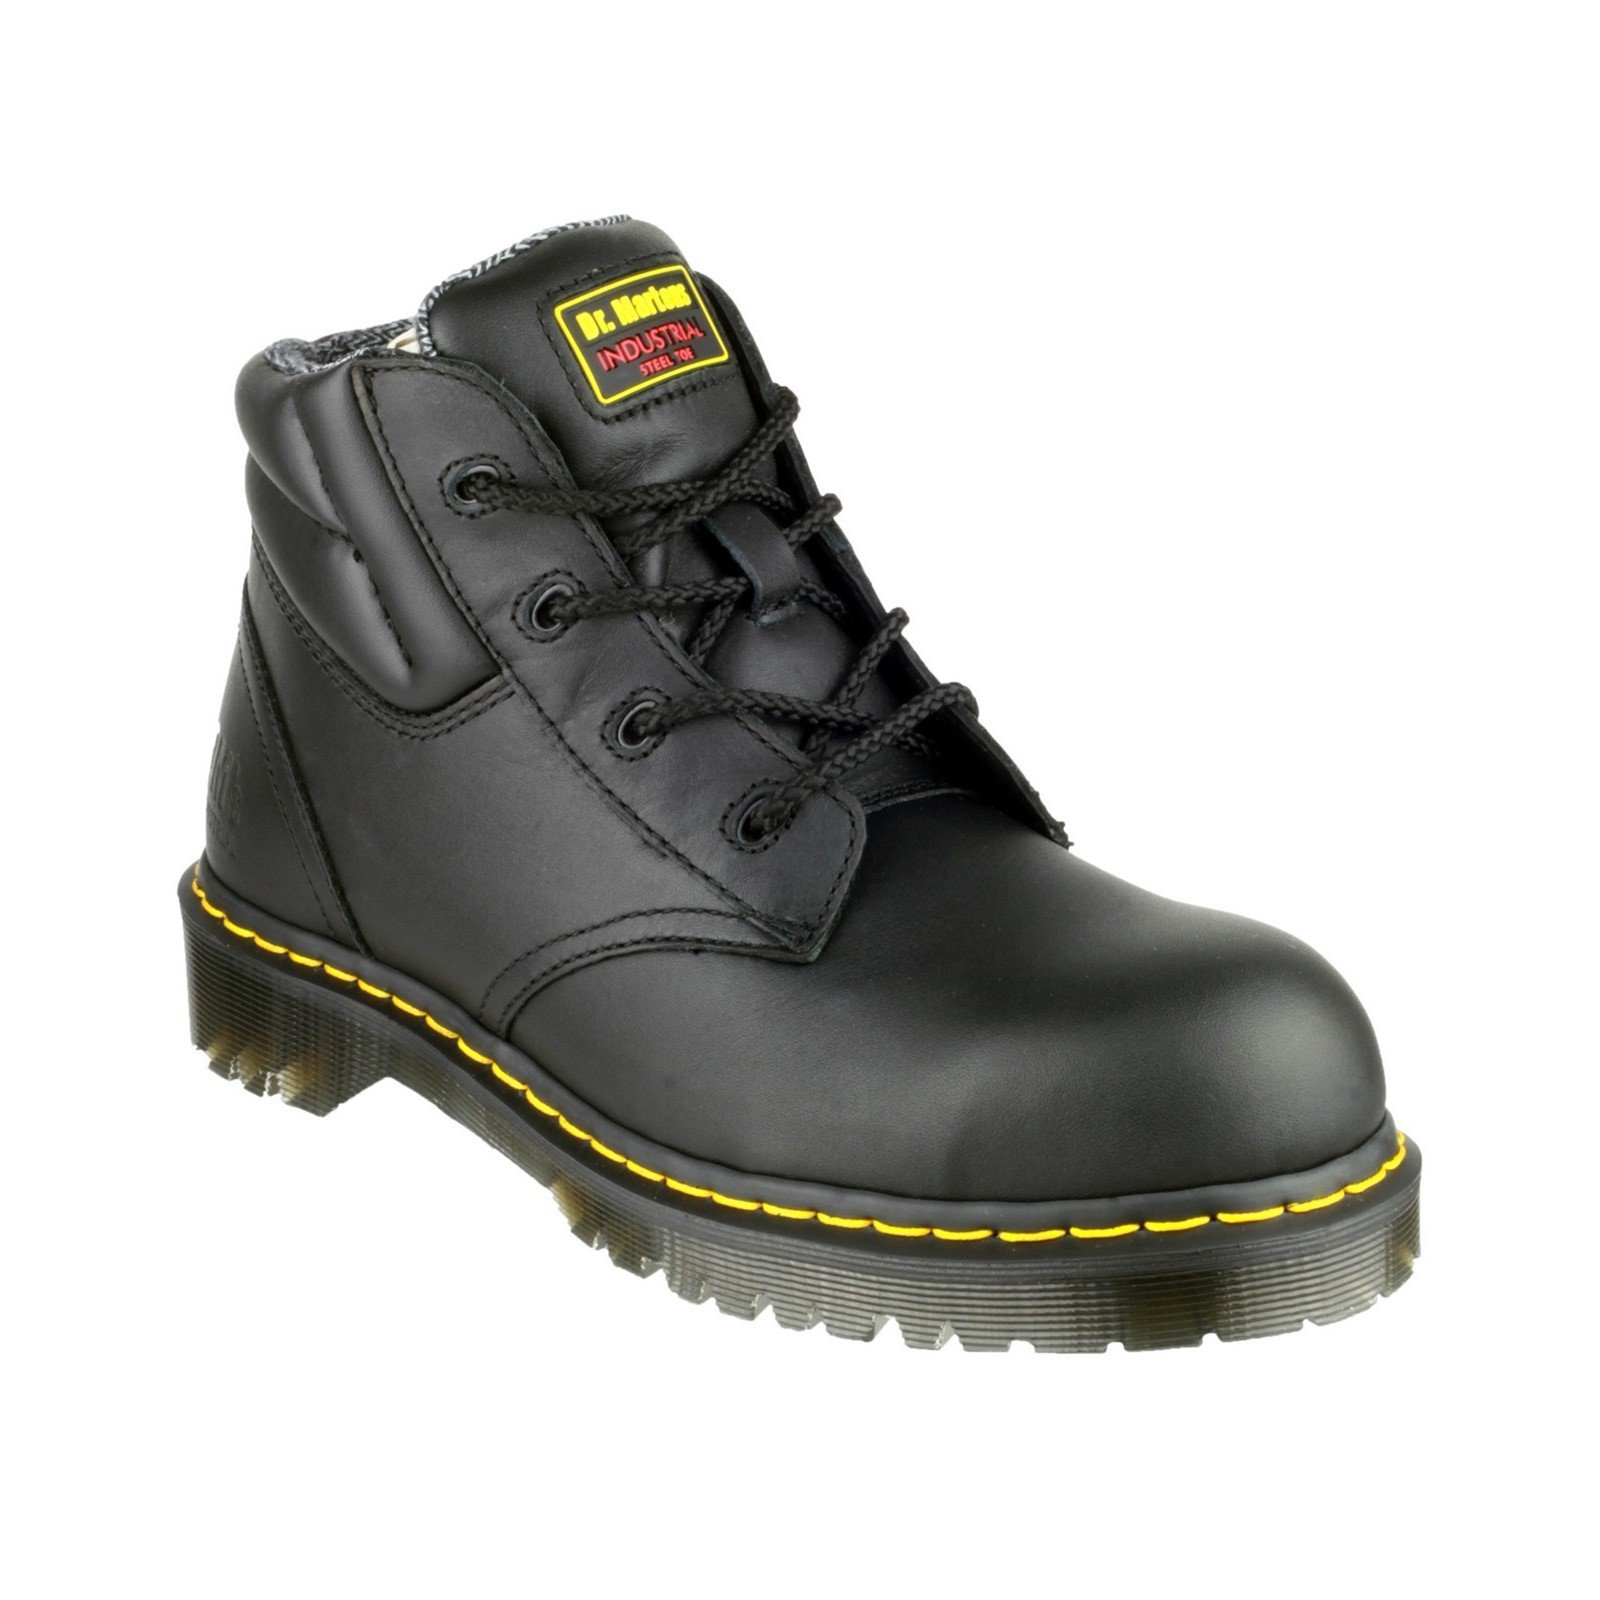 Dr Martens Unisex Lace-Up Boot Black 14068 - Black 12